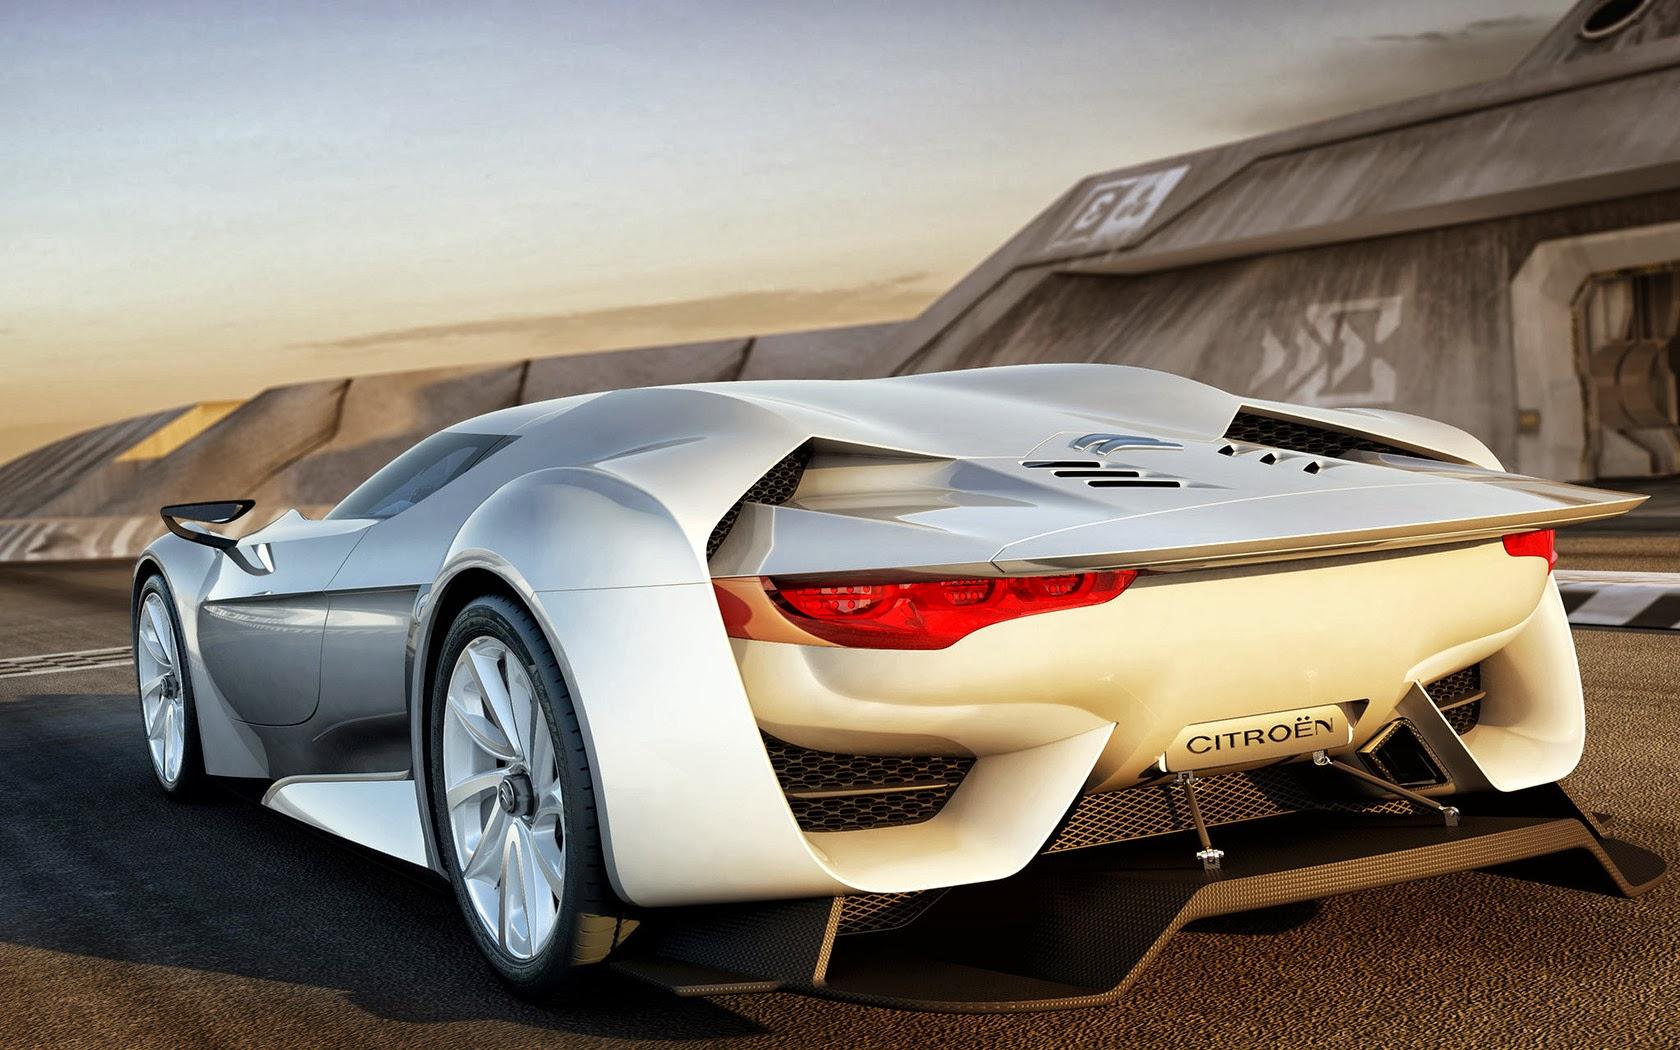 Citroen gt super deportivo carros usa